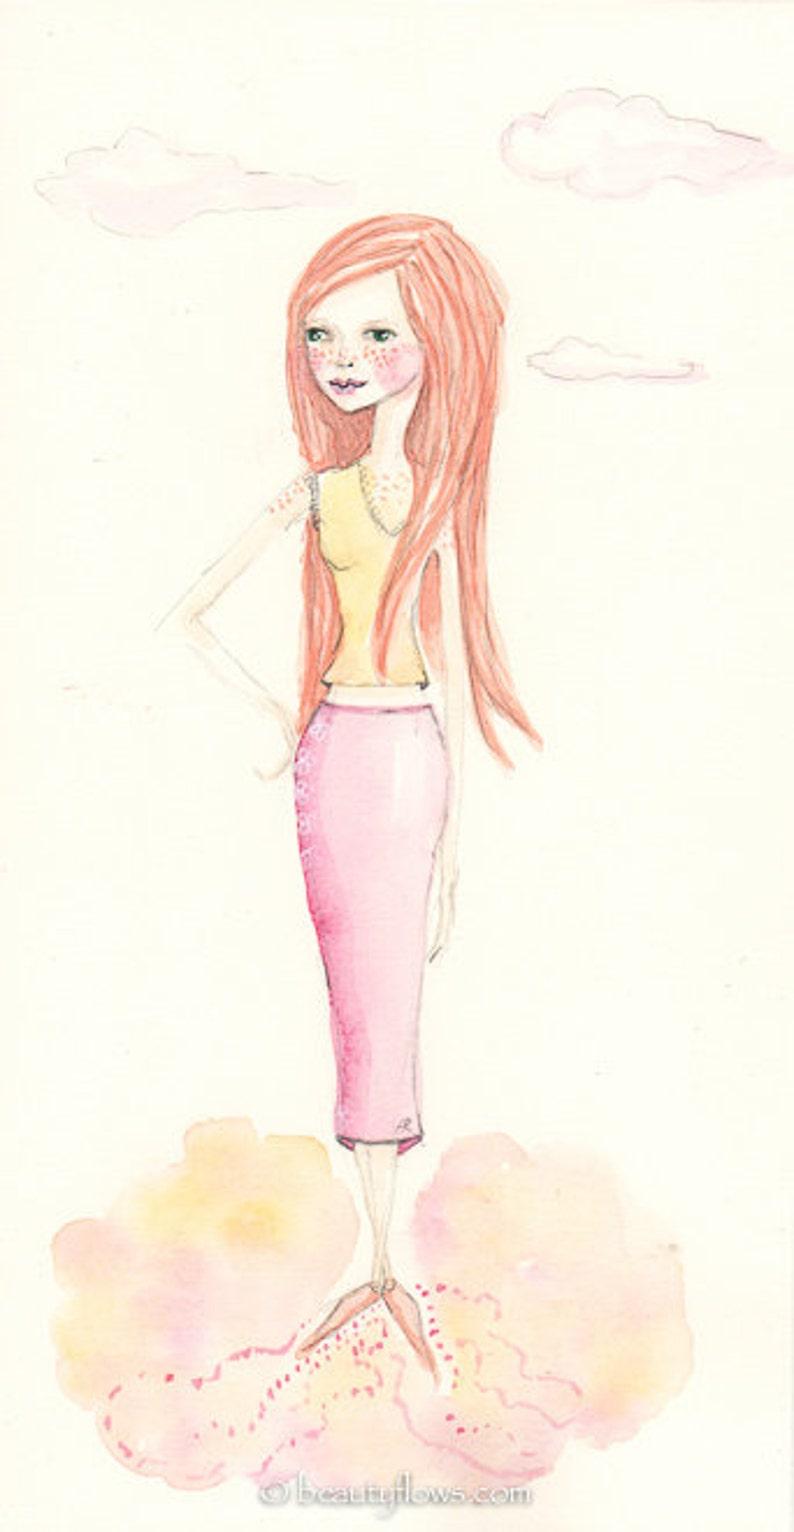 Peach Freckles Watercolor Painting OOAK Redhead Gal image 0